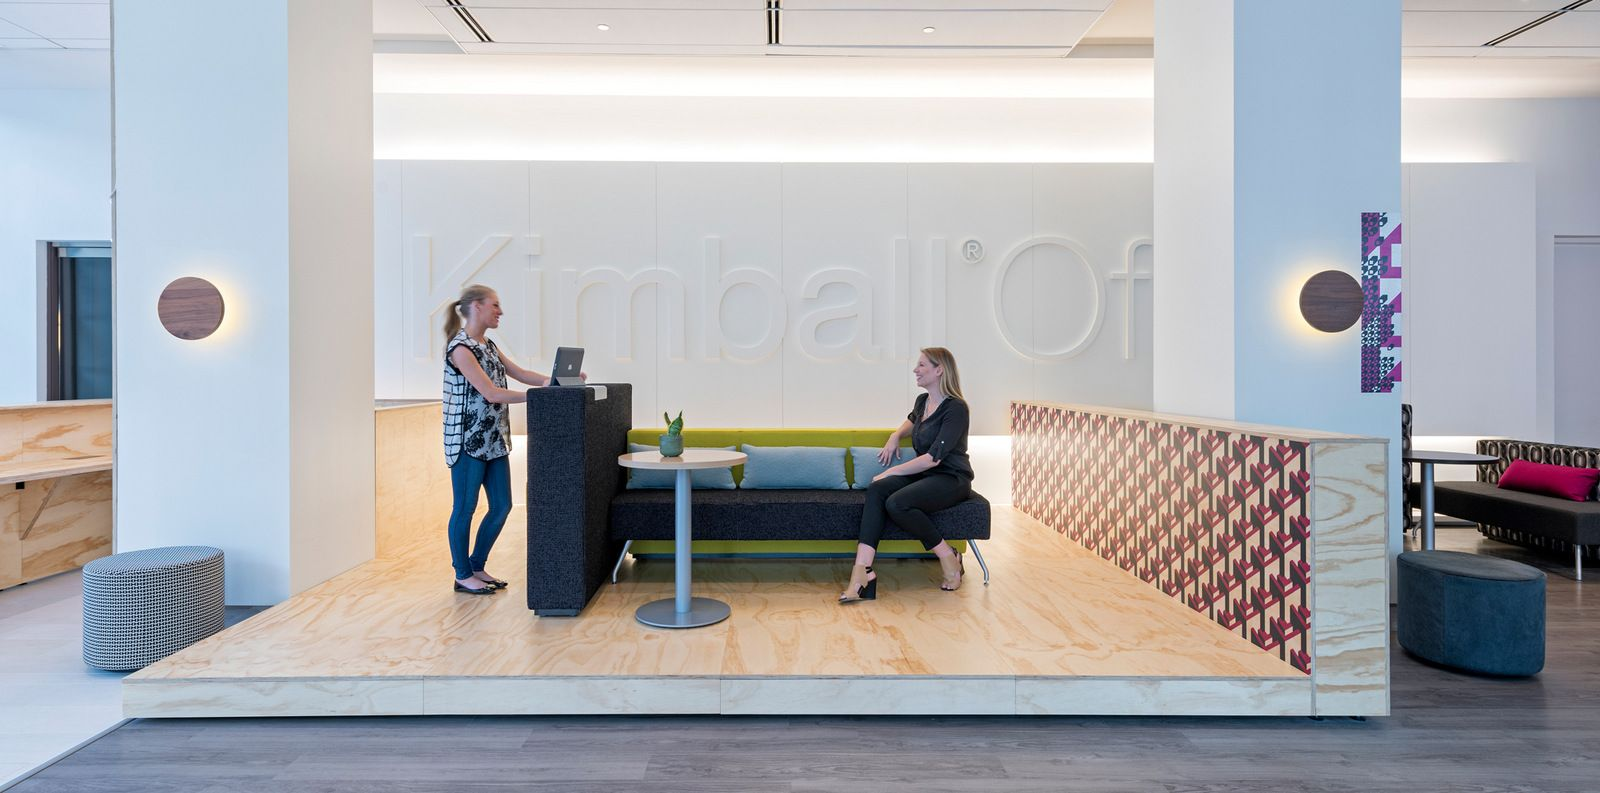 kimball office orders uber yelp. Kimball Office Orders Uber And Yelp For Chicago Showroom | Showroom, Studio